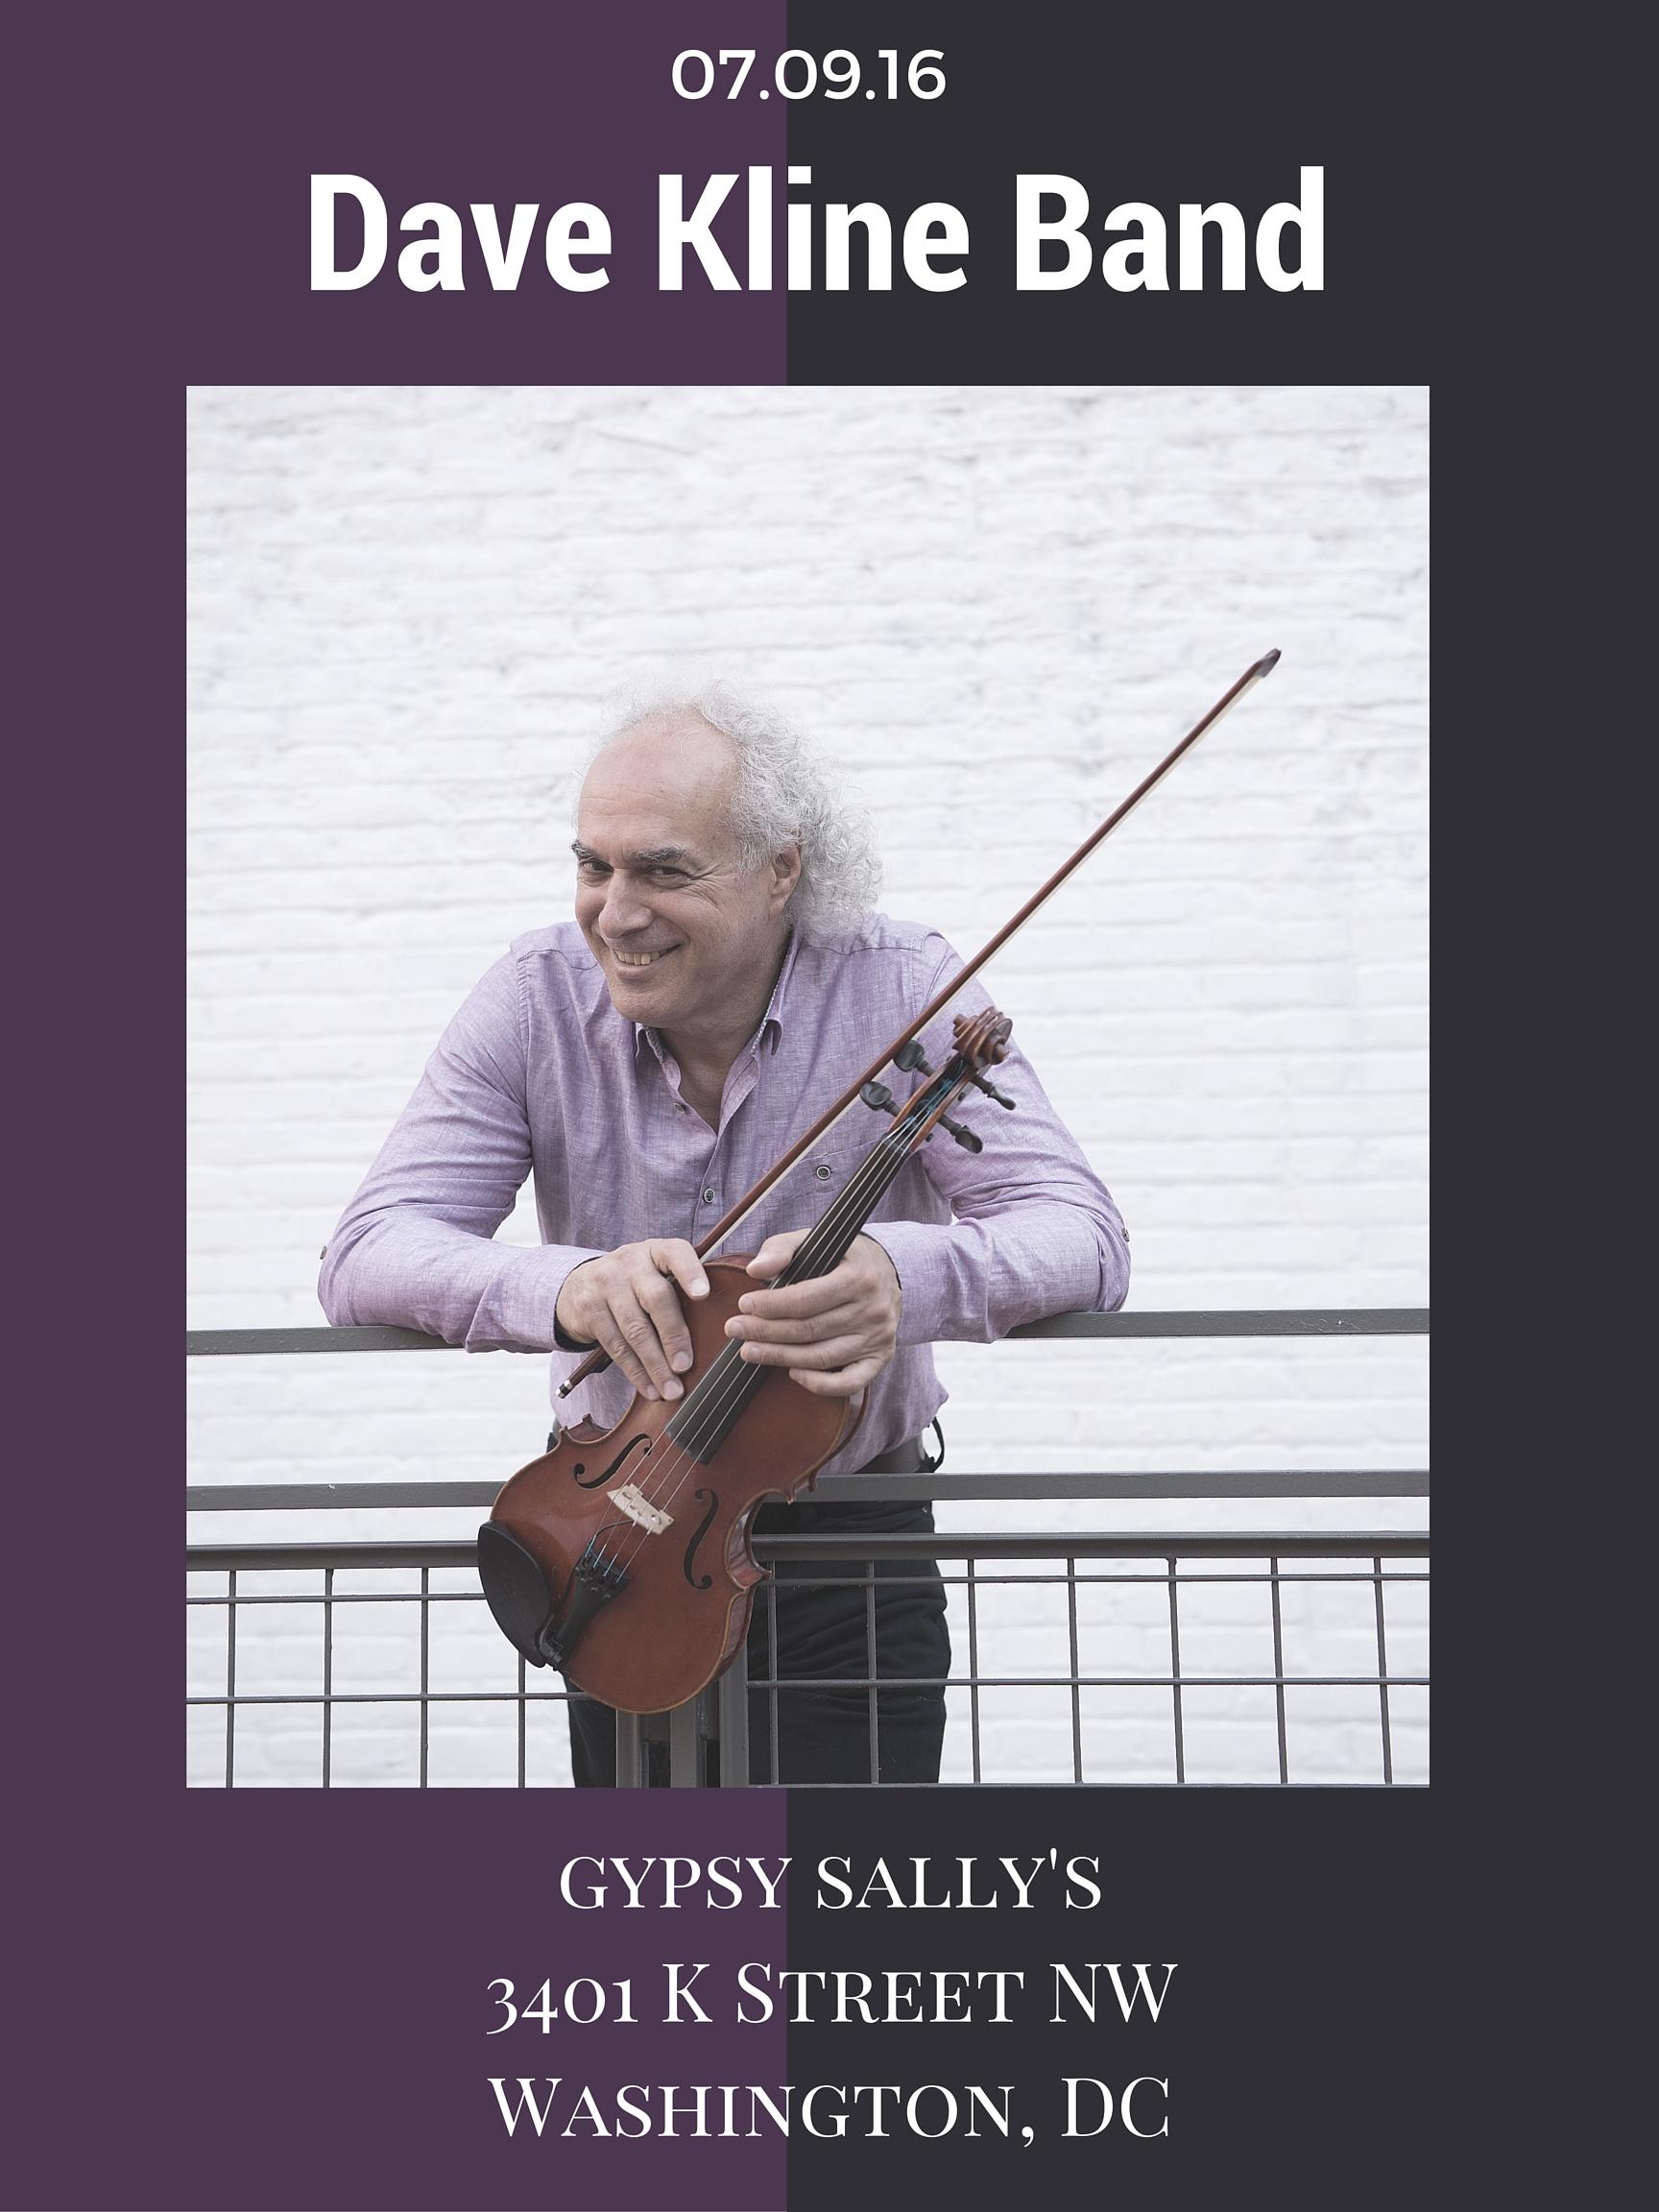 dave kline band gypsy sally's